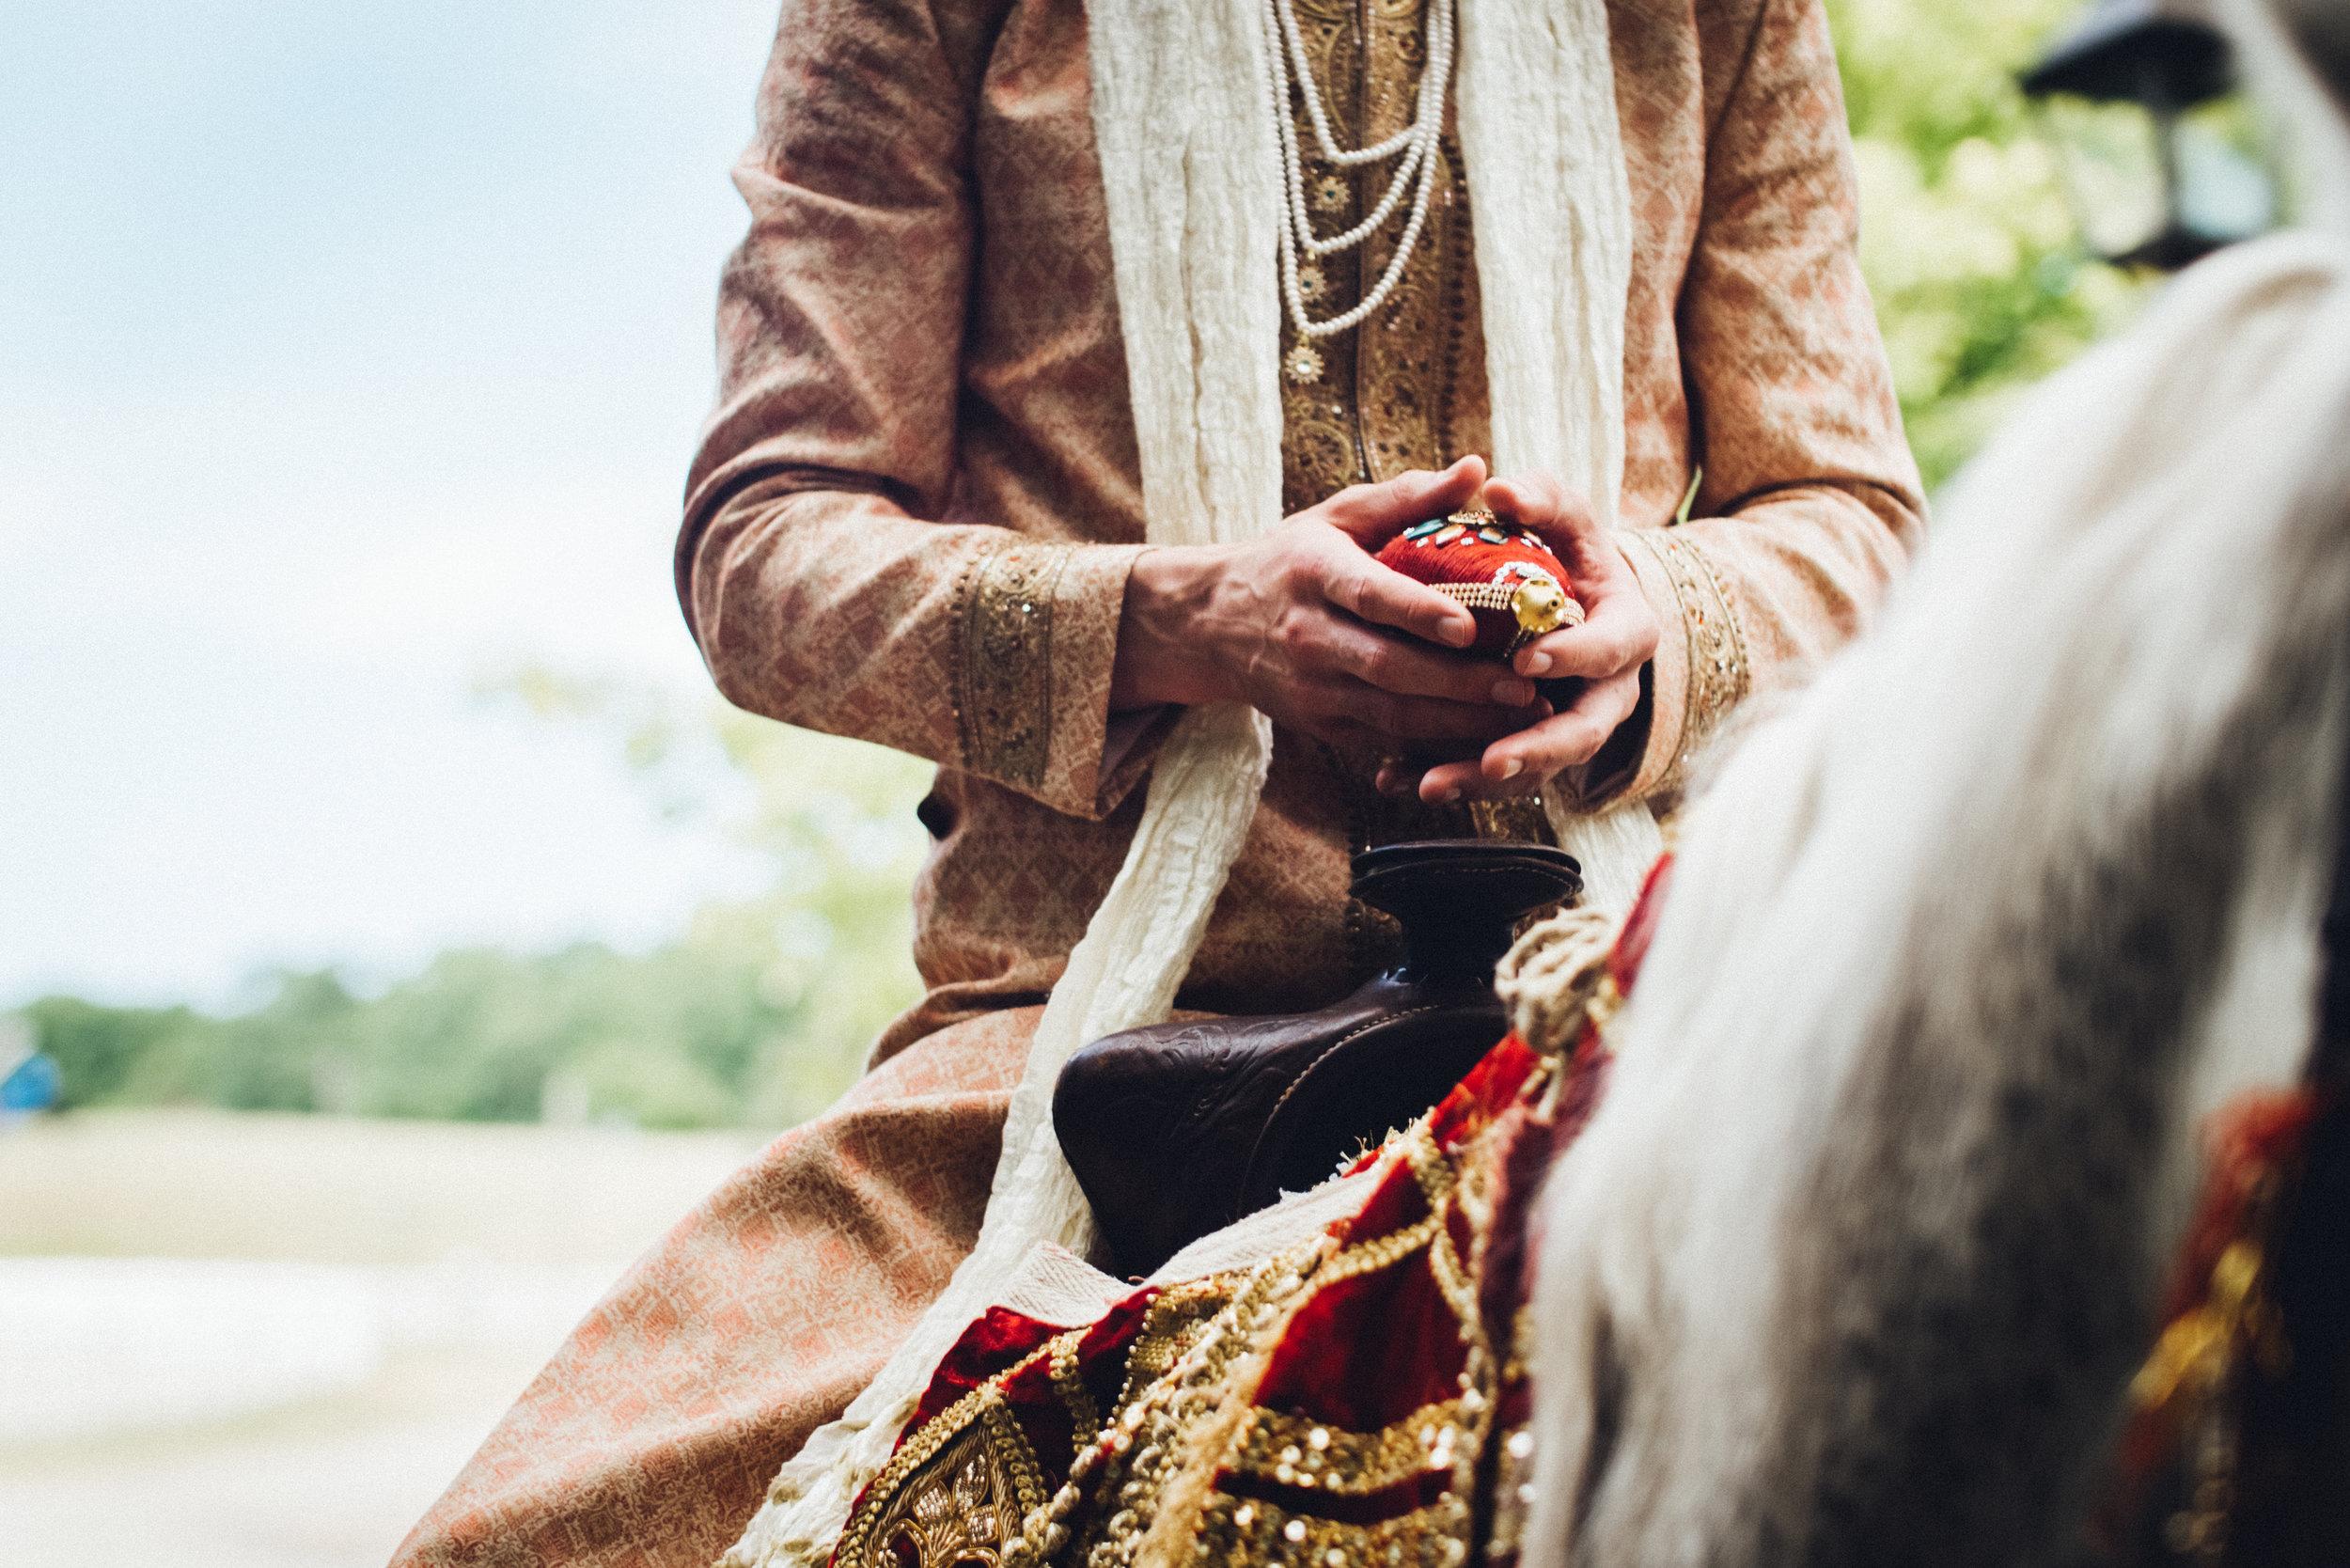 avani-khristoph-becker-bhatt-wedding-videography-photography-cinematography-shadow-shine-pictures-award-winning-michigan-detorit